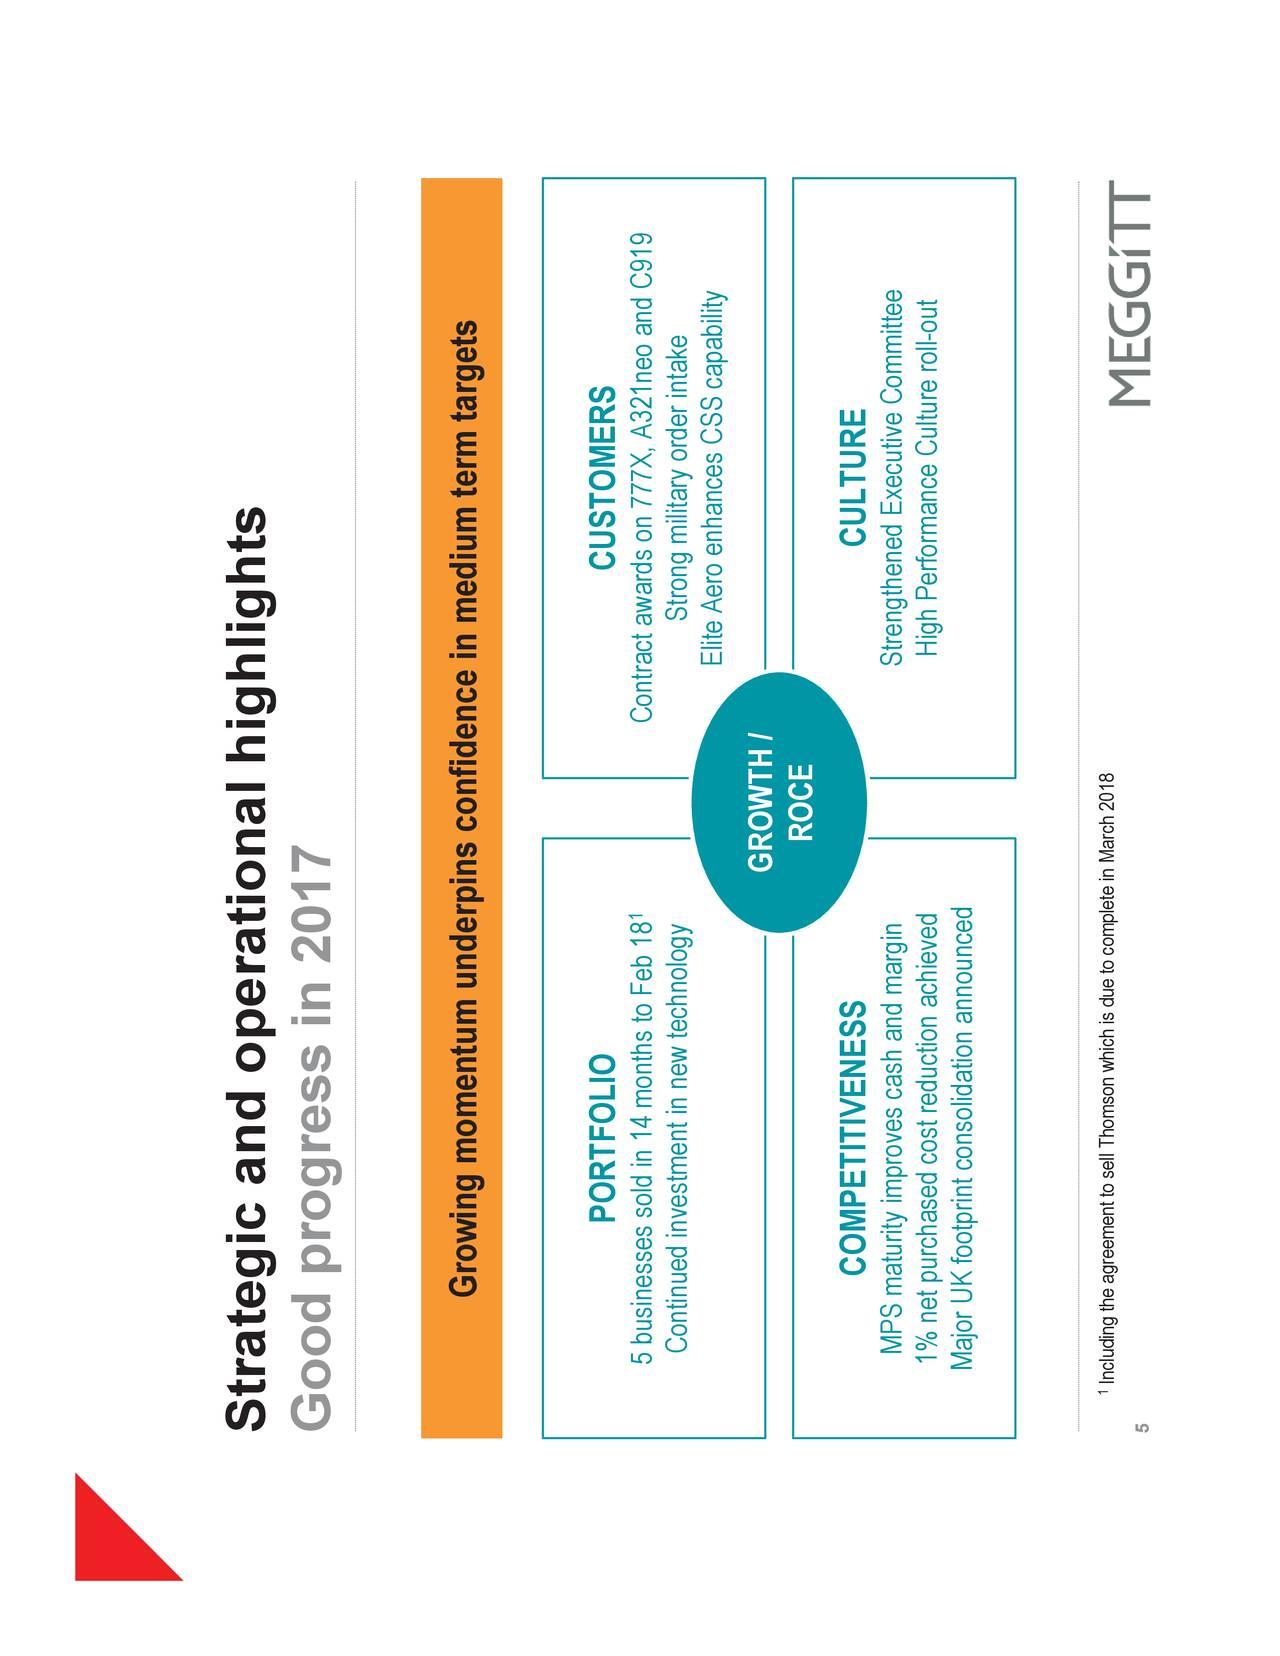 Meggitt consolidating businesses